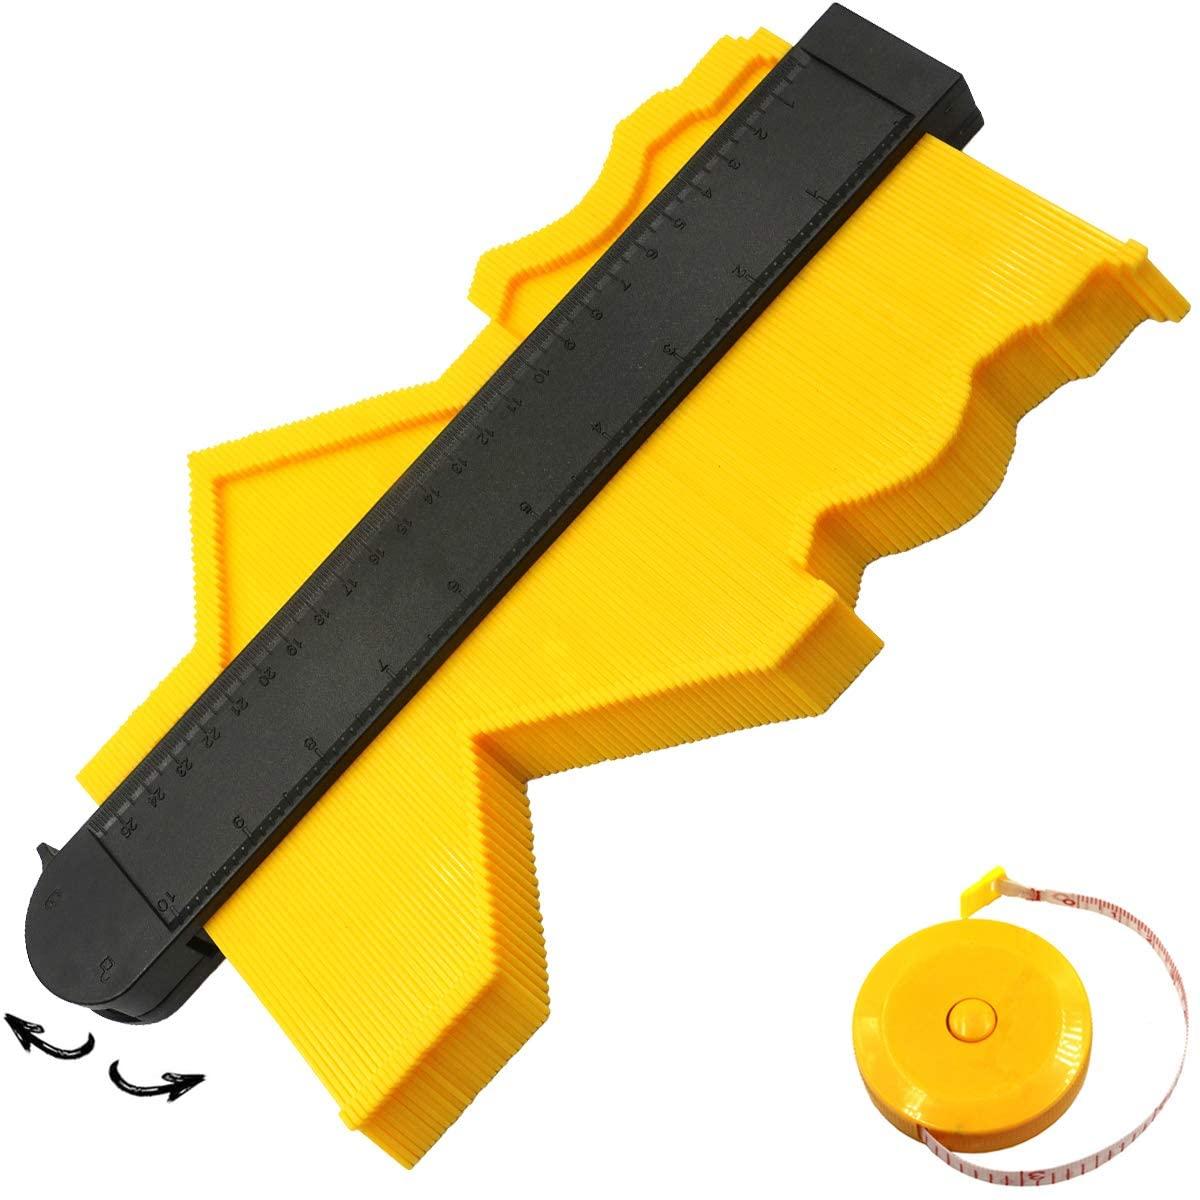 Contour Gauge with Lock, 10 Inch Contour Gauge with Lock Precisely Copy Irregular Shapes, Contour Gauge Shape Duplicator Edge Shaping Measure Ruler